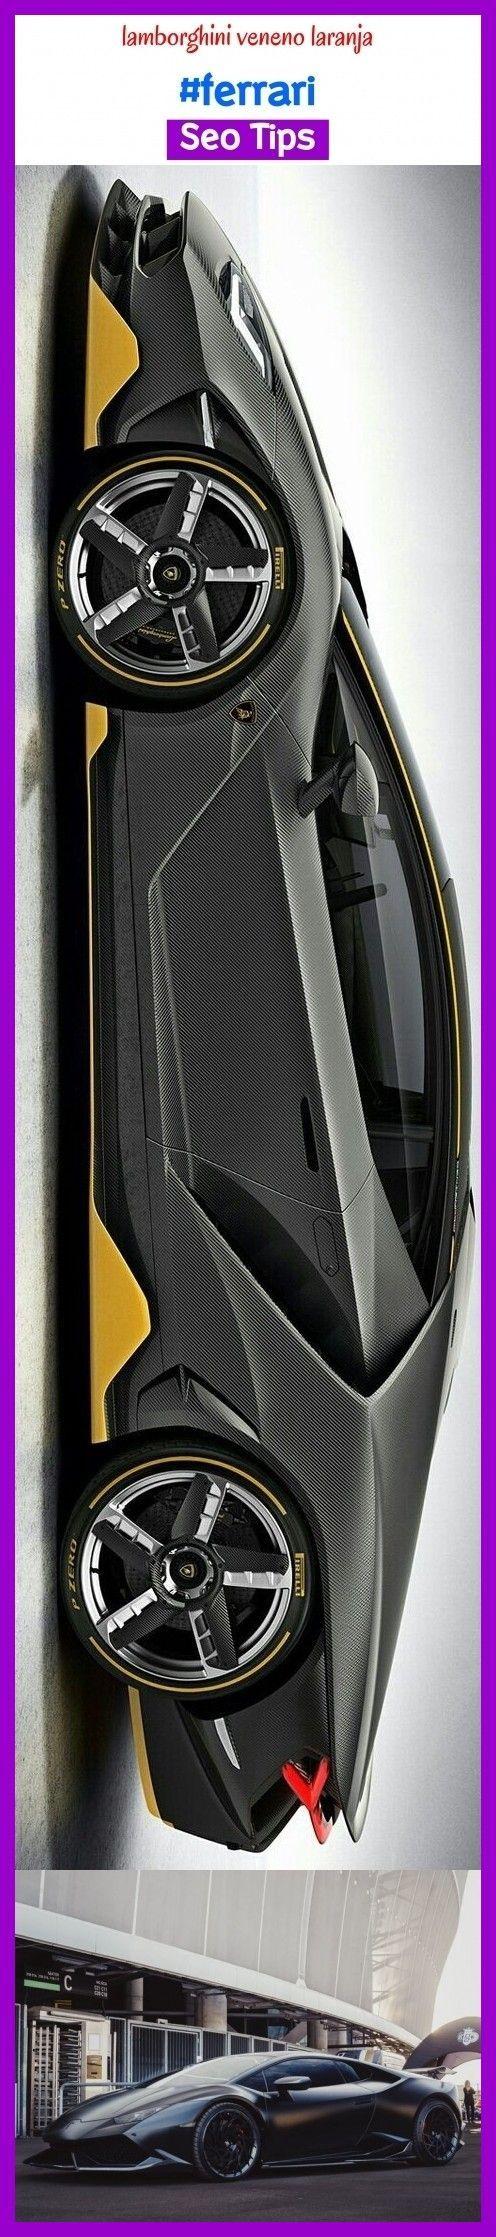 Lamborghini veneno laranja #ferrari #blog #seo #trending. lamborghini veneno bla…